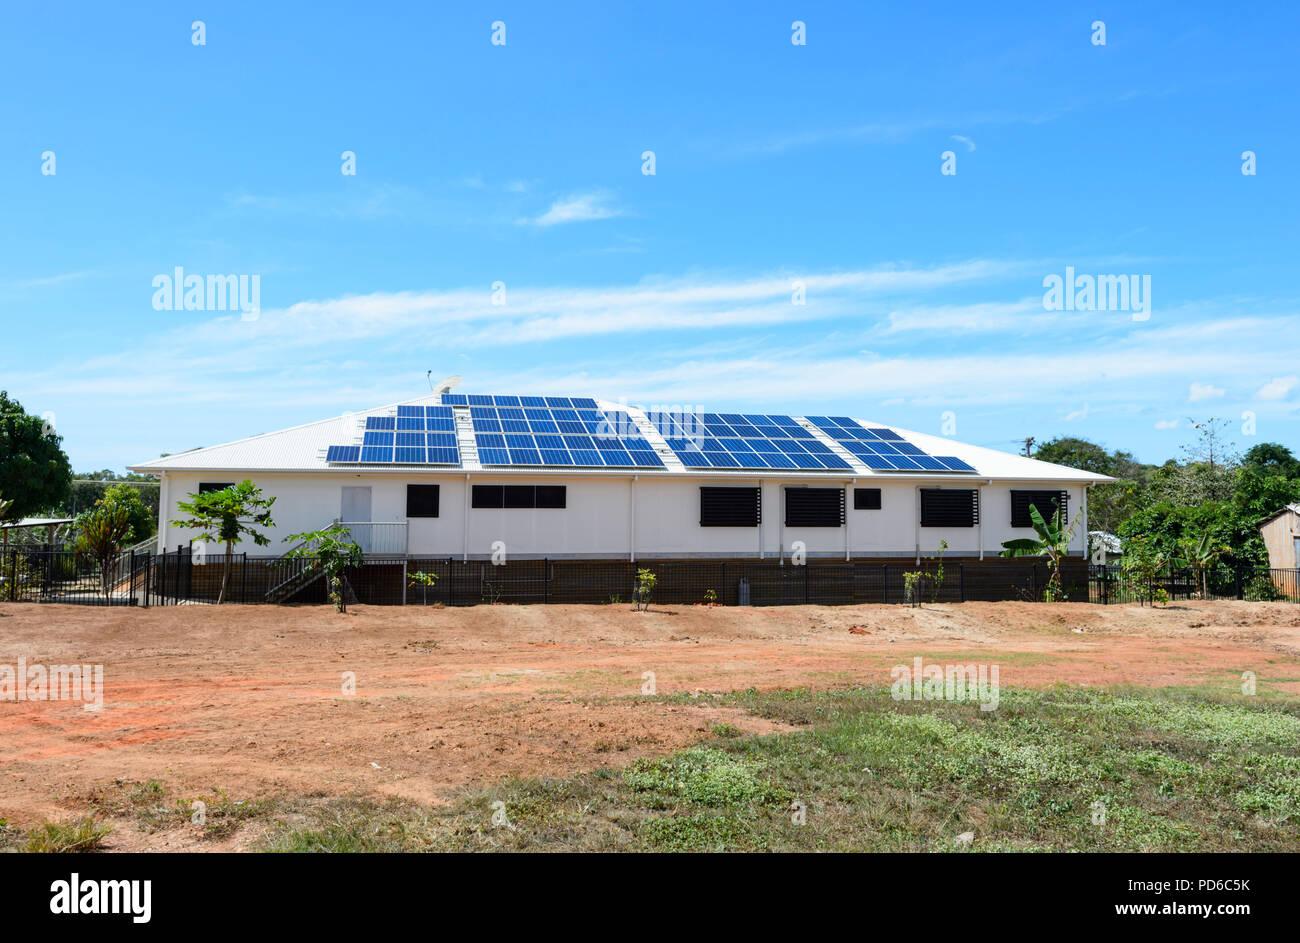 Paneles solares en el tejado de una casa en Lockhart River, Cape York, Far North Queensland, FNQ, Queensland, Australia Imagen De Stock